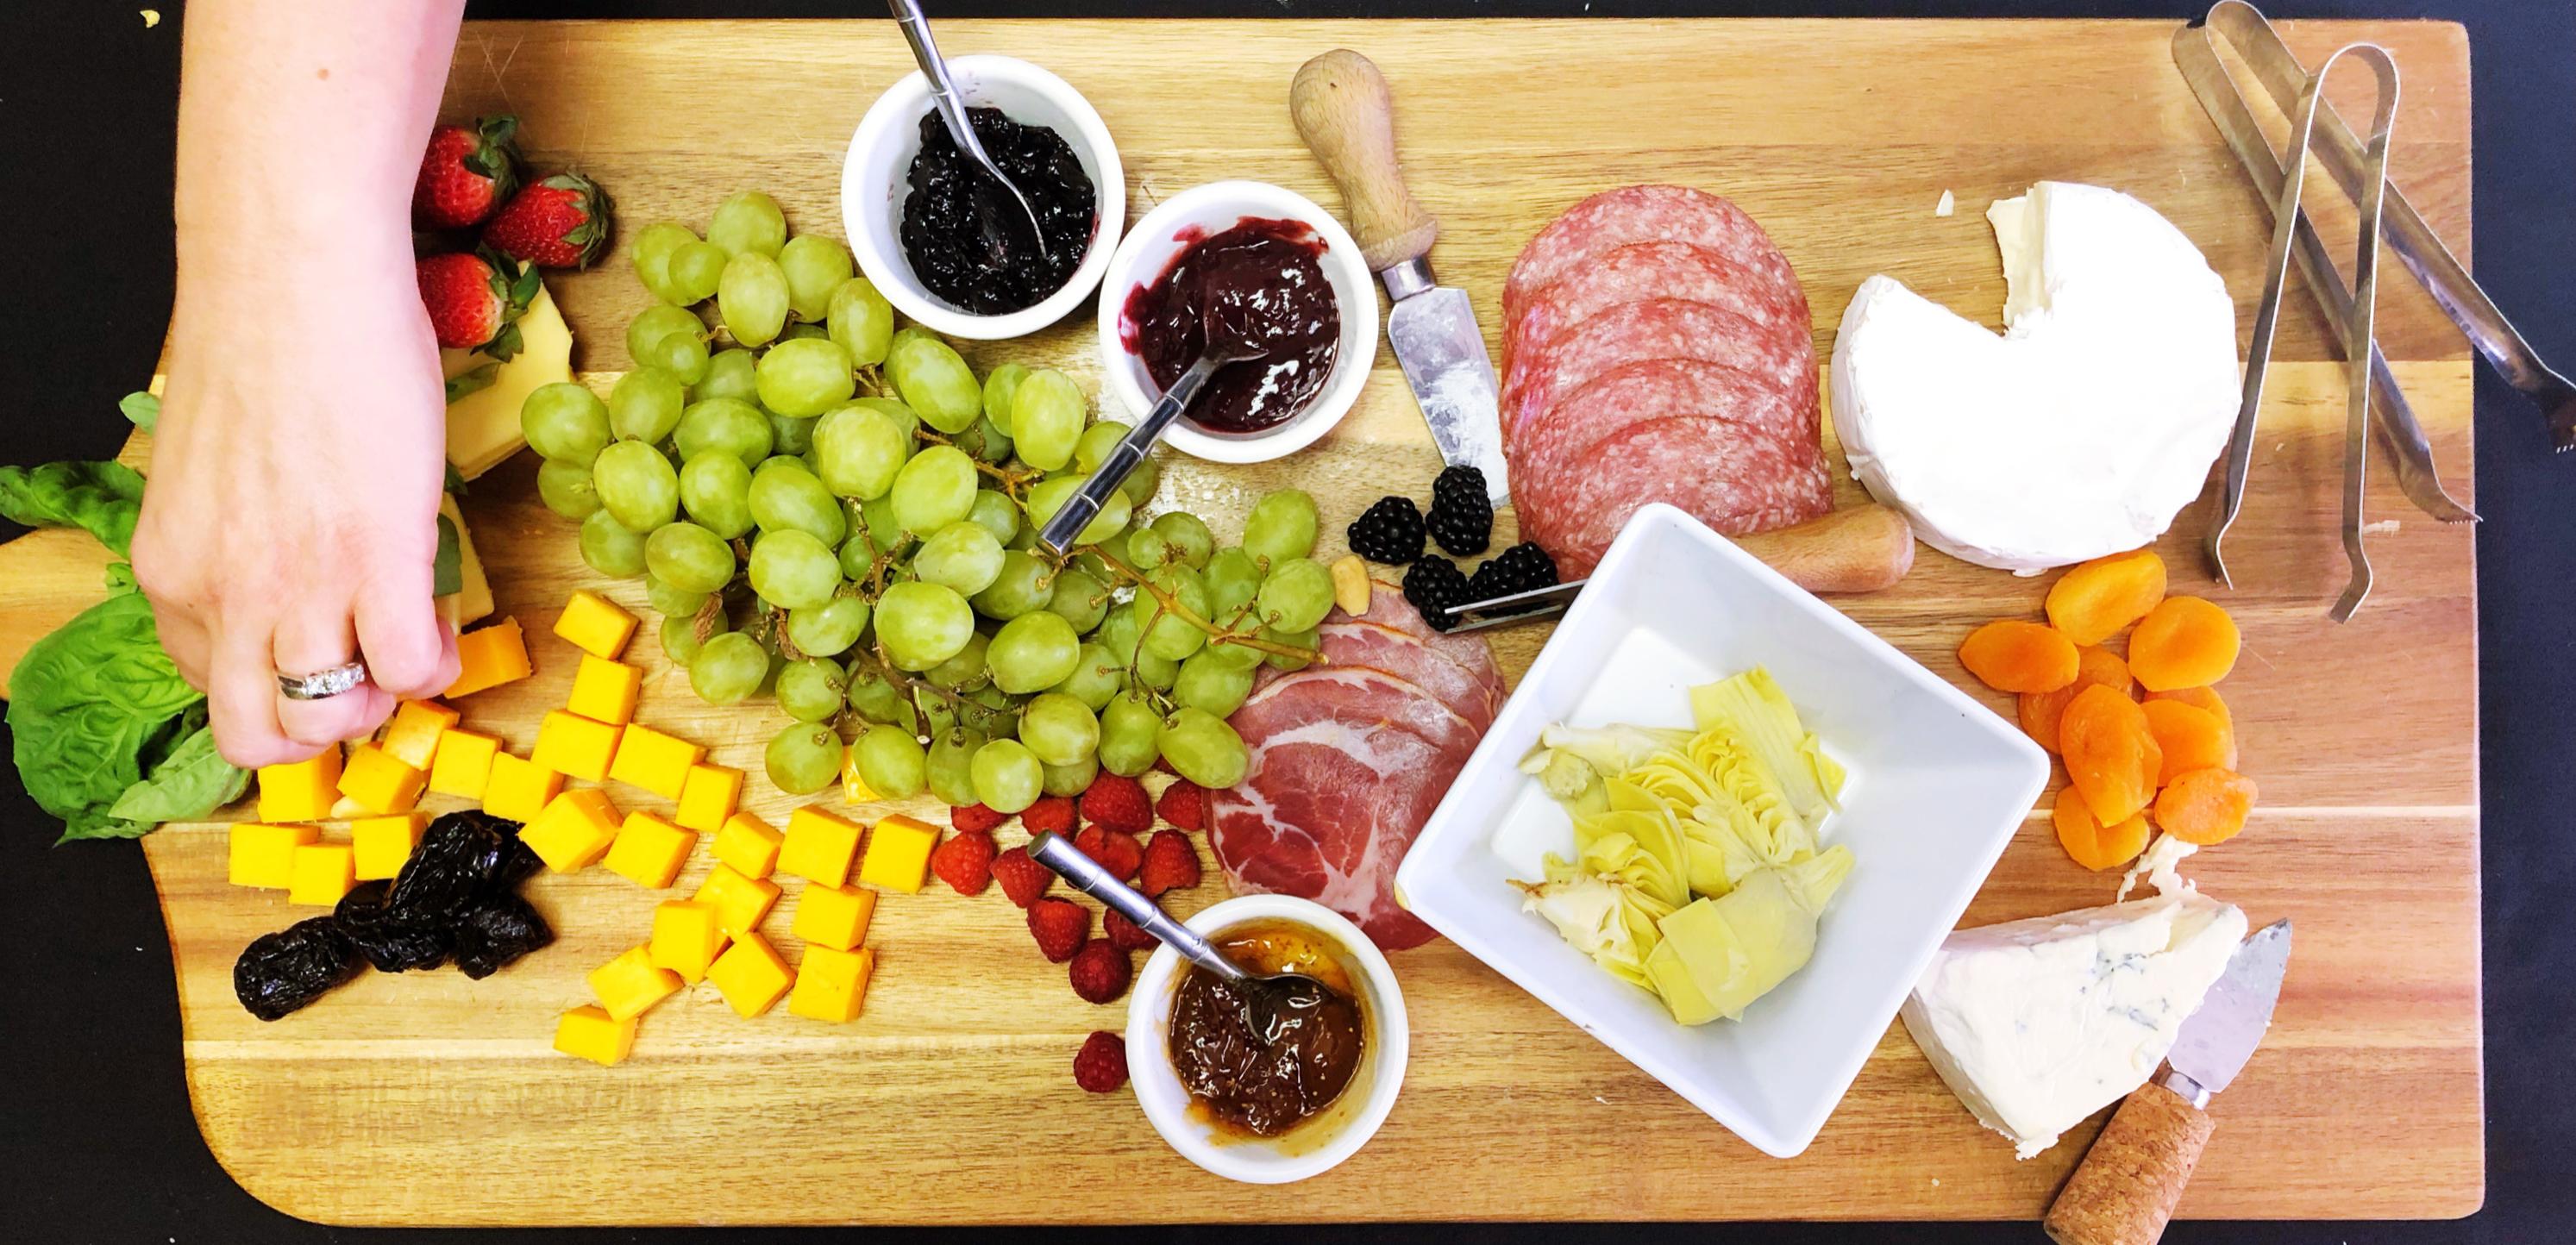 Charcuterie & International Cheese Variety